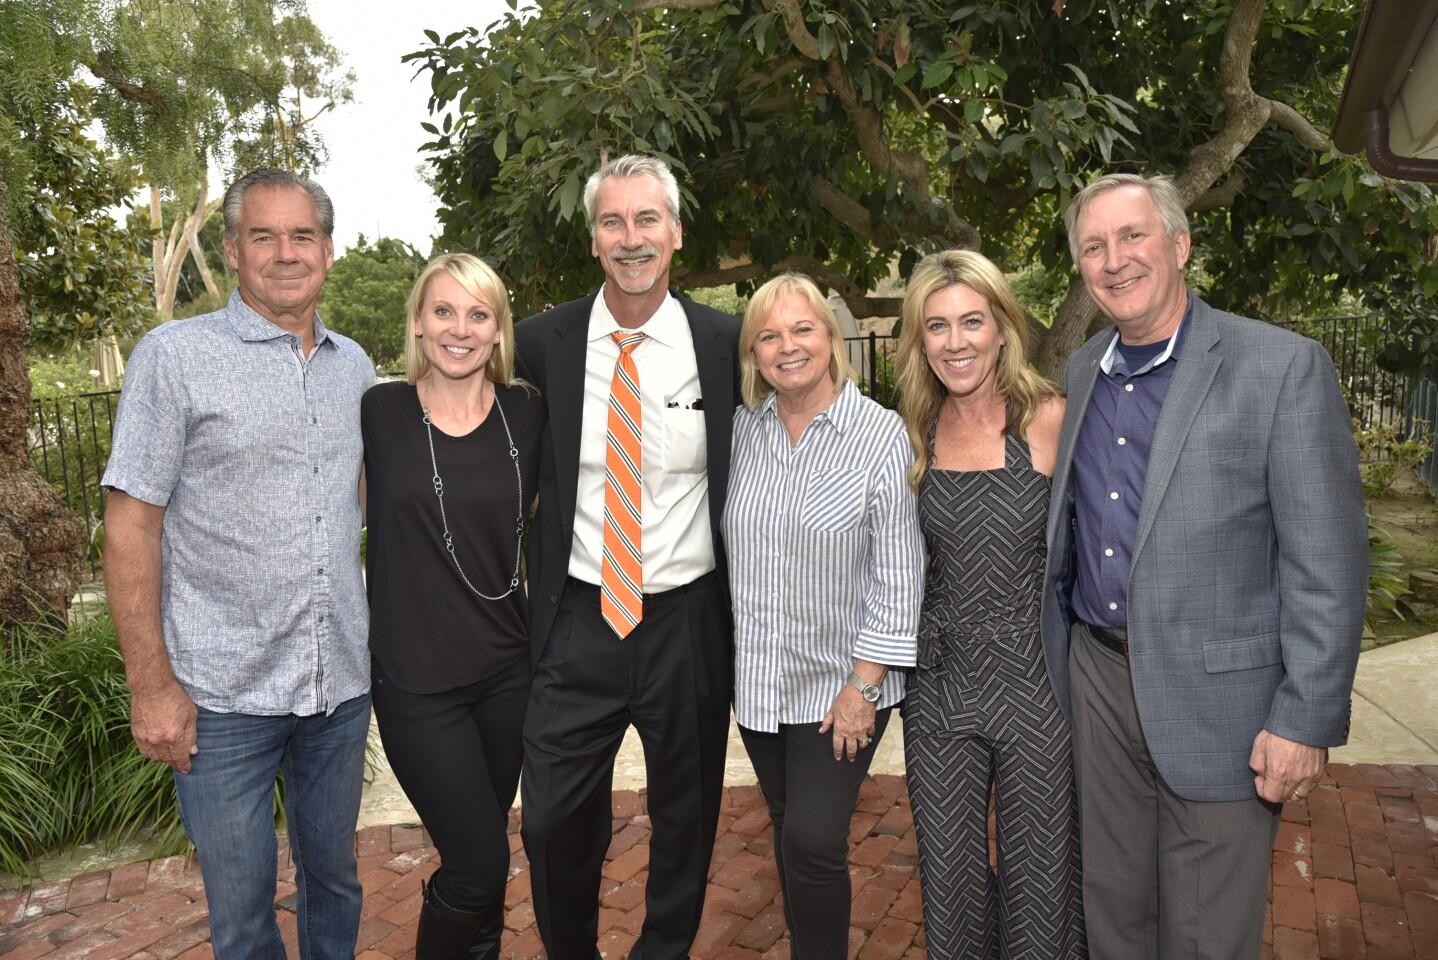 Mike McCarthy, Social Committee co-chair Jerah Payne, Ron Elgart, Beverly Robinson, Connie Sundstrom, Greg Grajek